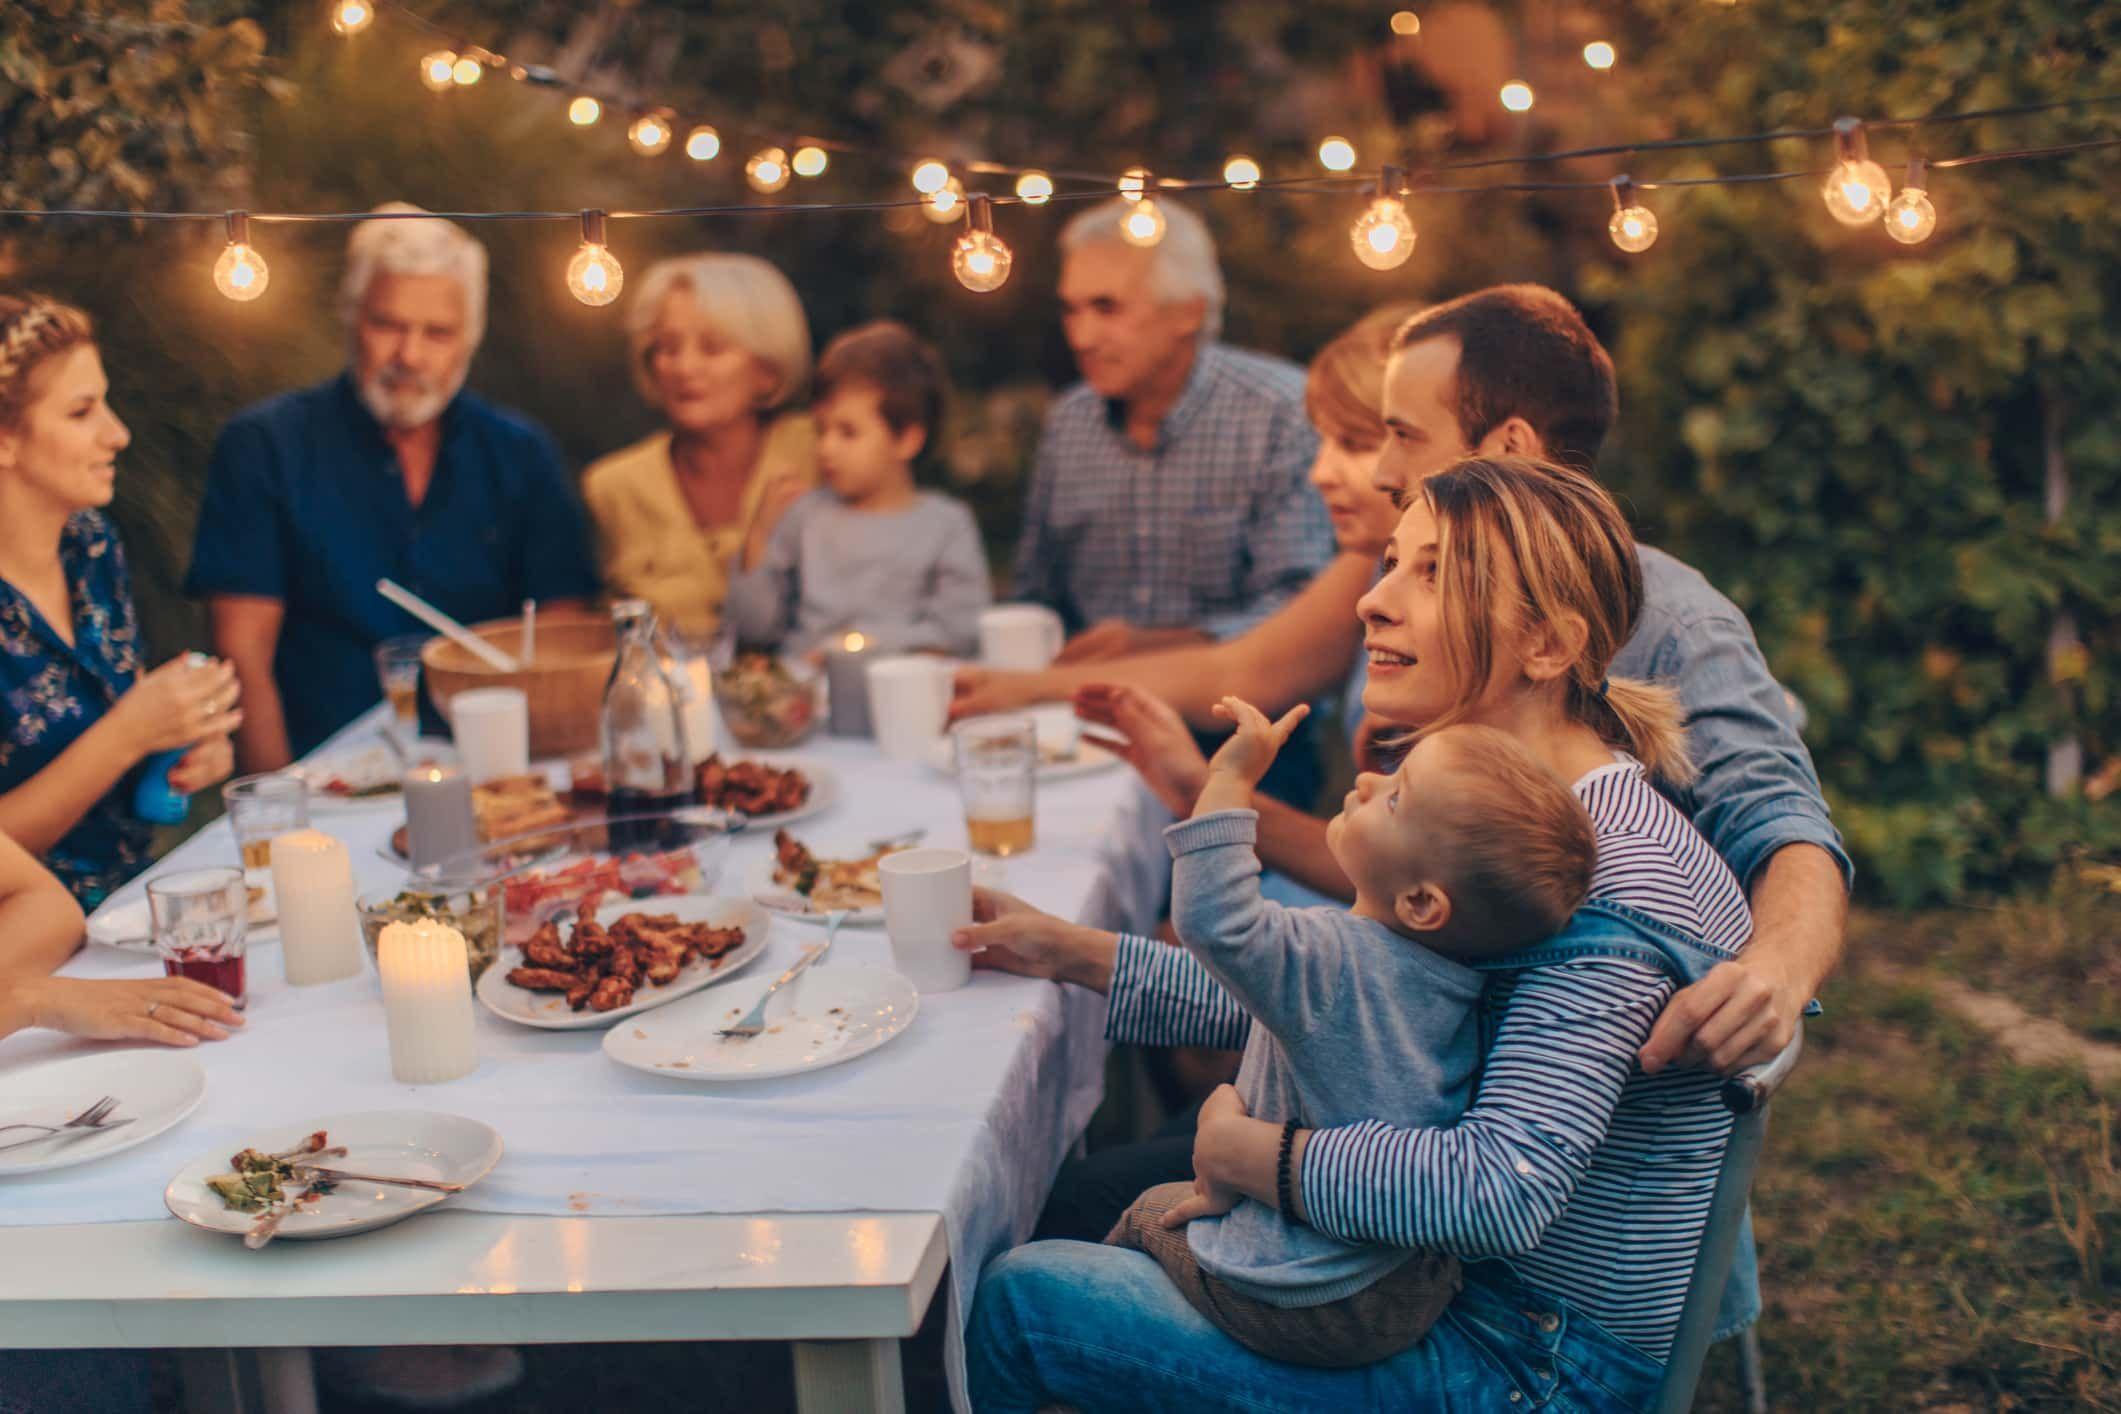 Minim Konflik, Ini 9 Kunci Rahasia Rumah Tangga Bahagia